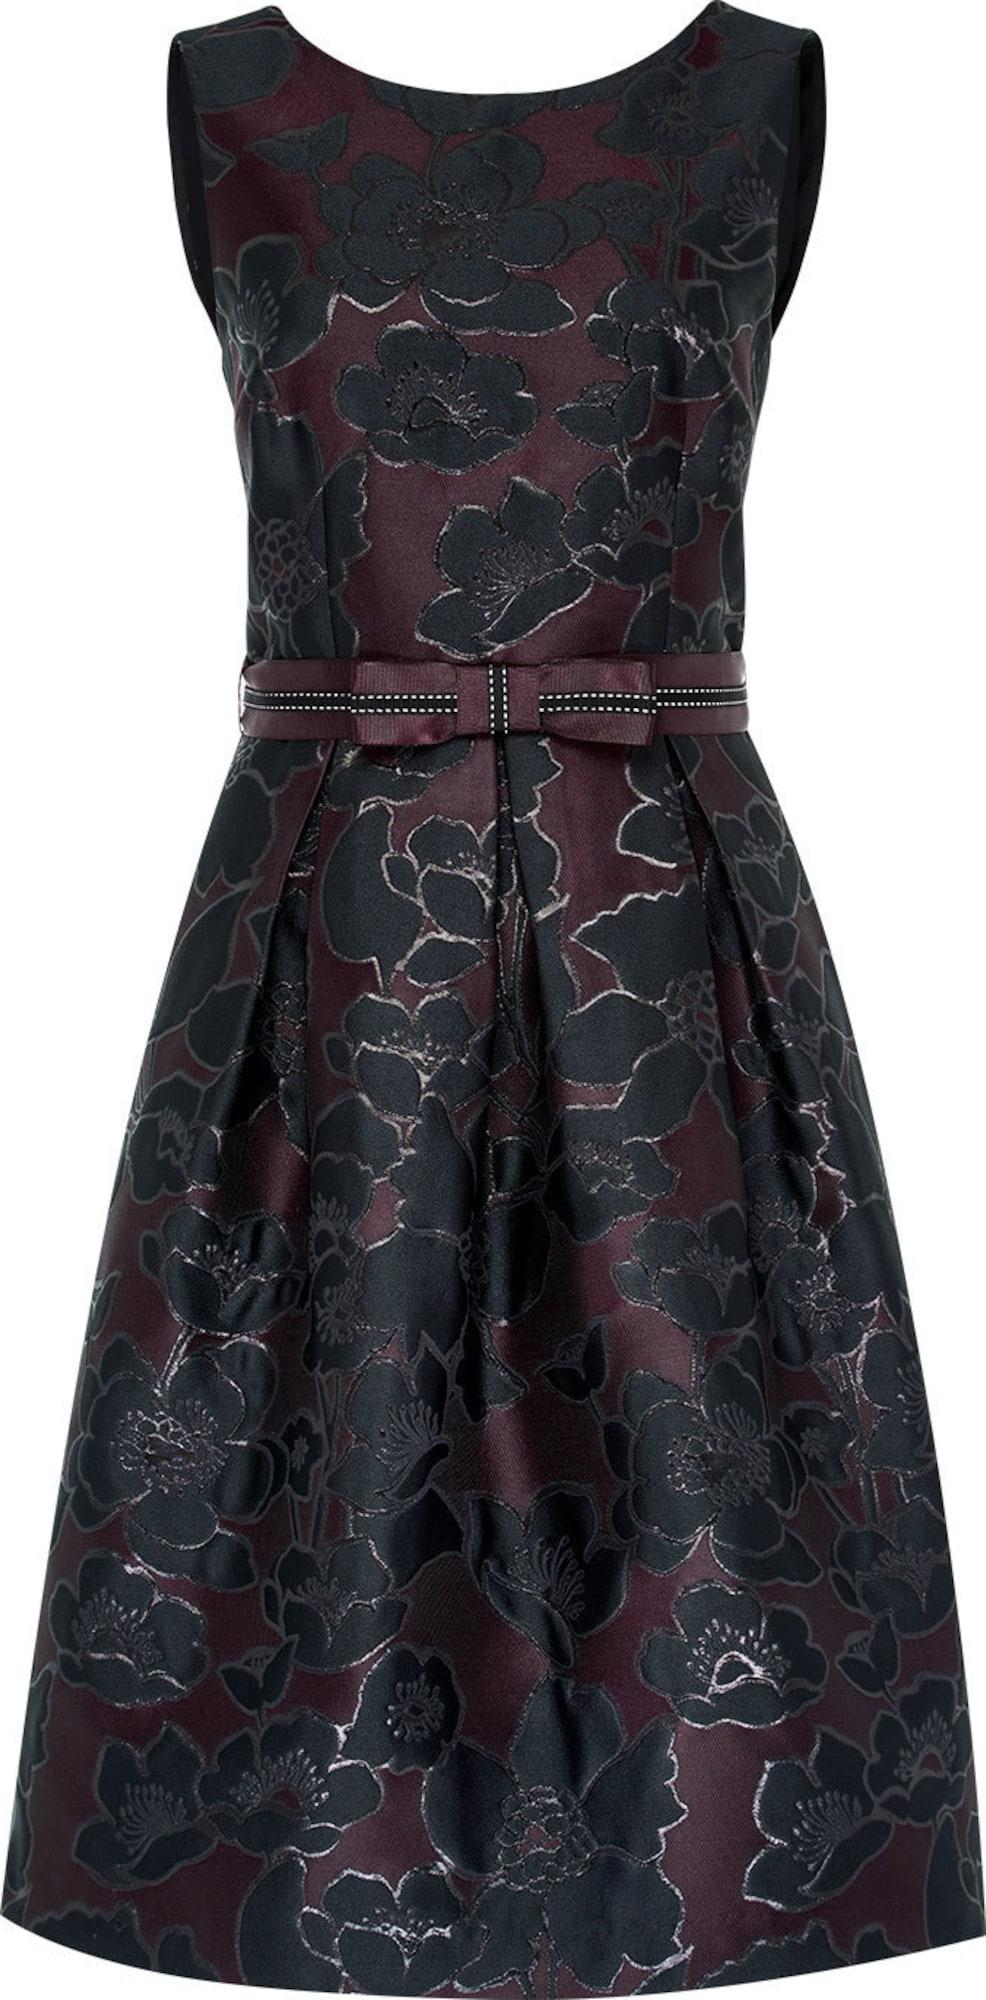 hallhuber jacquard kleid mit ripsg rtel in mischfarben about you. Black Bedroom Furniture Sets. Home Design Ideas